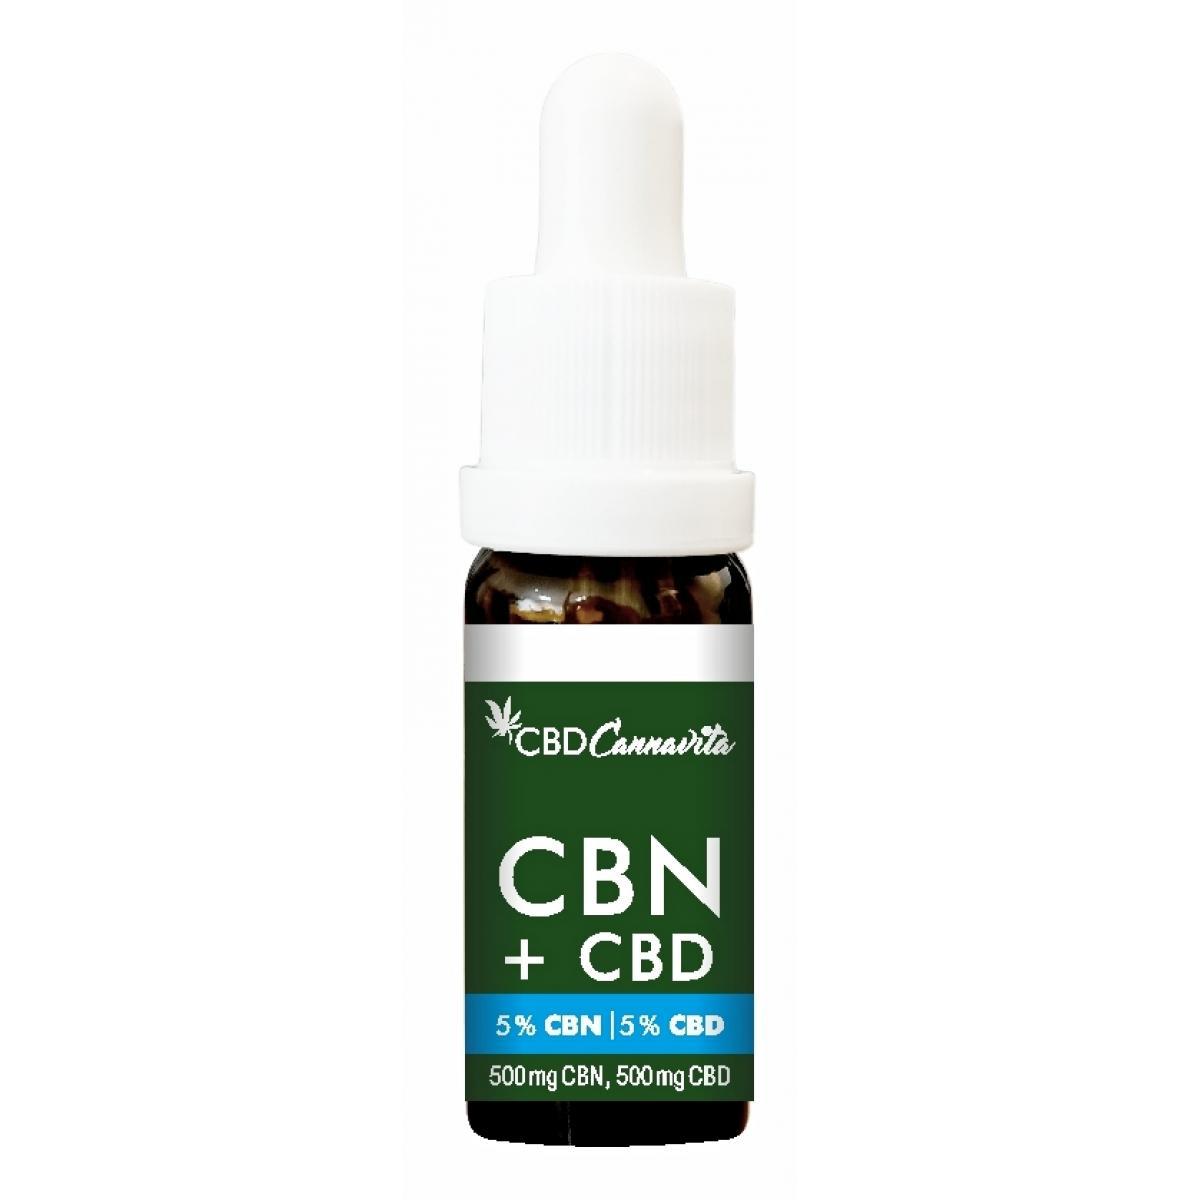 CBN 5% + CBD 5% - 10ml